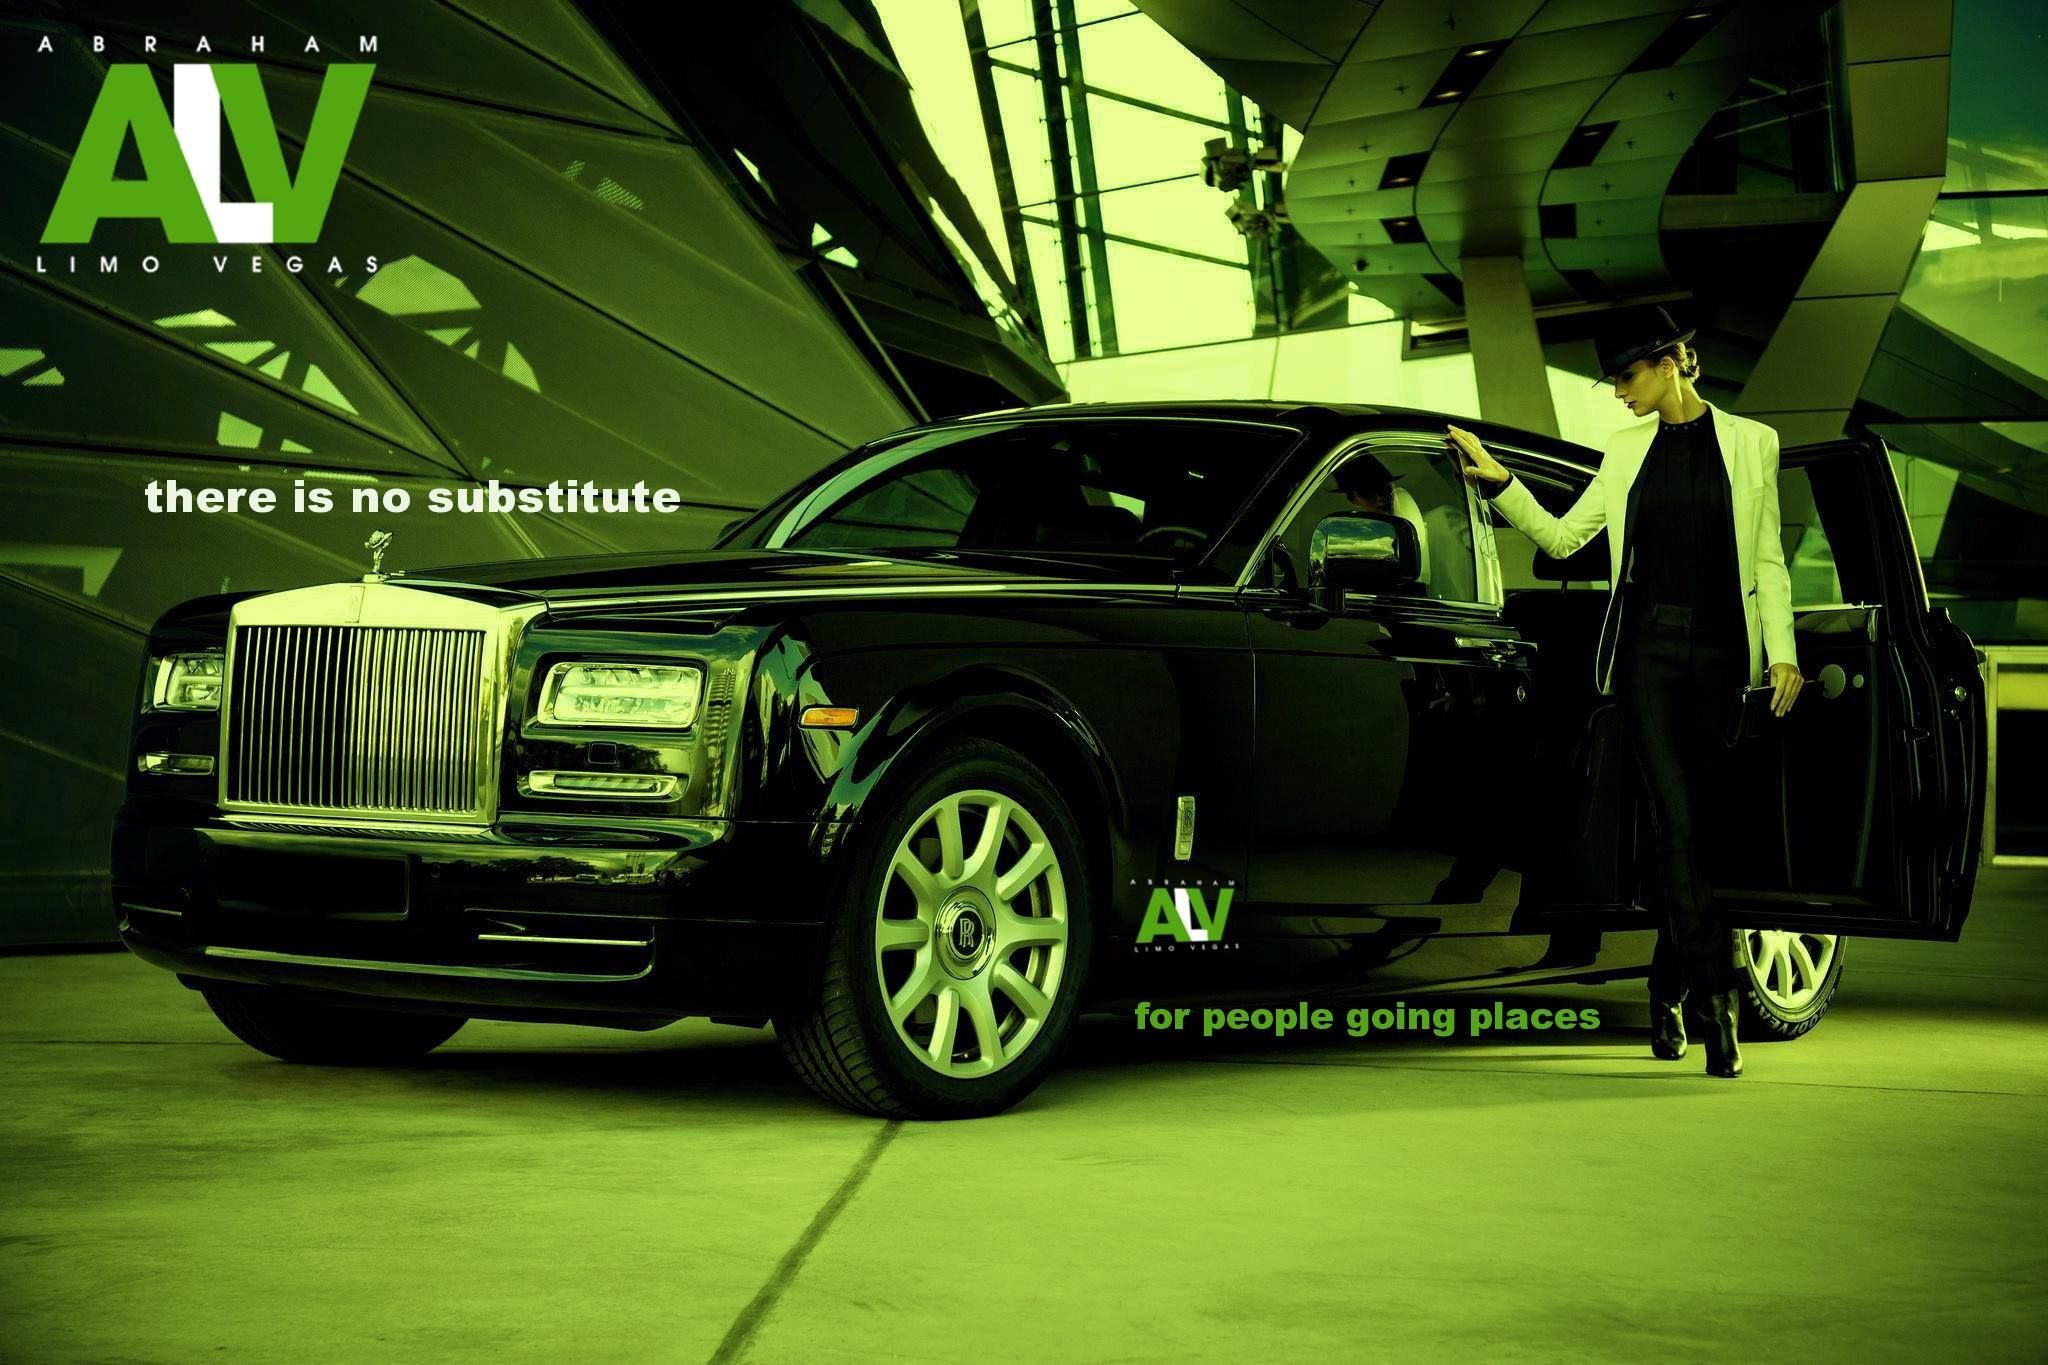 Abraham Limo Service Rolls Royce Motor Cars Rolls Royce